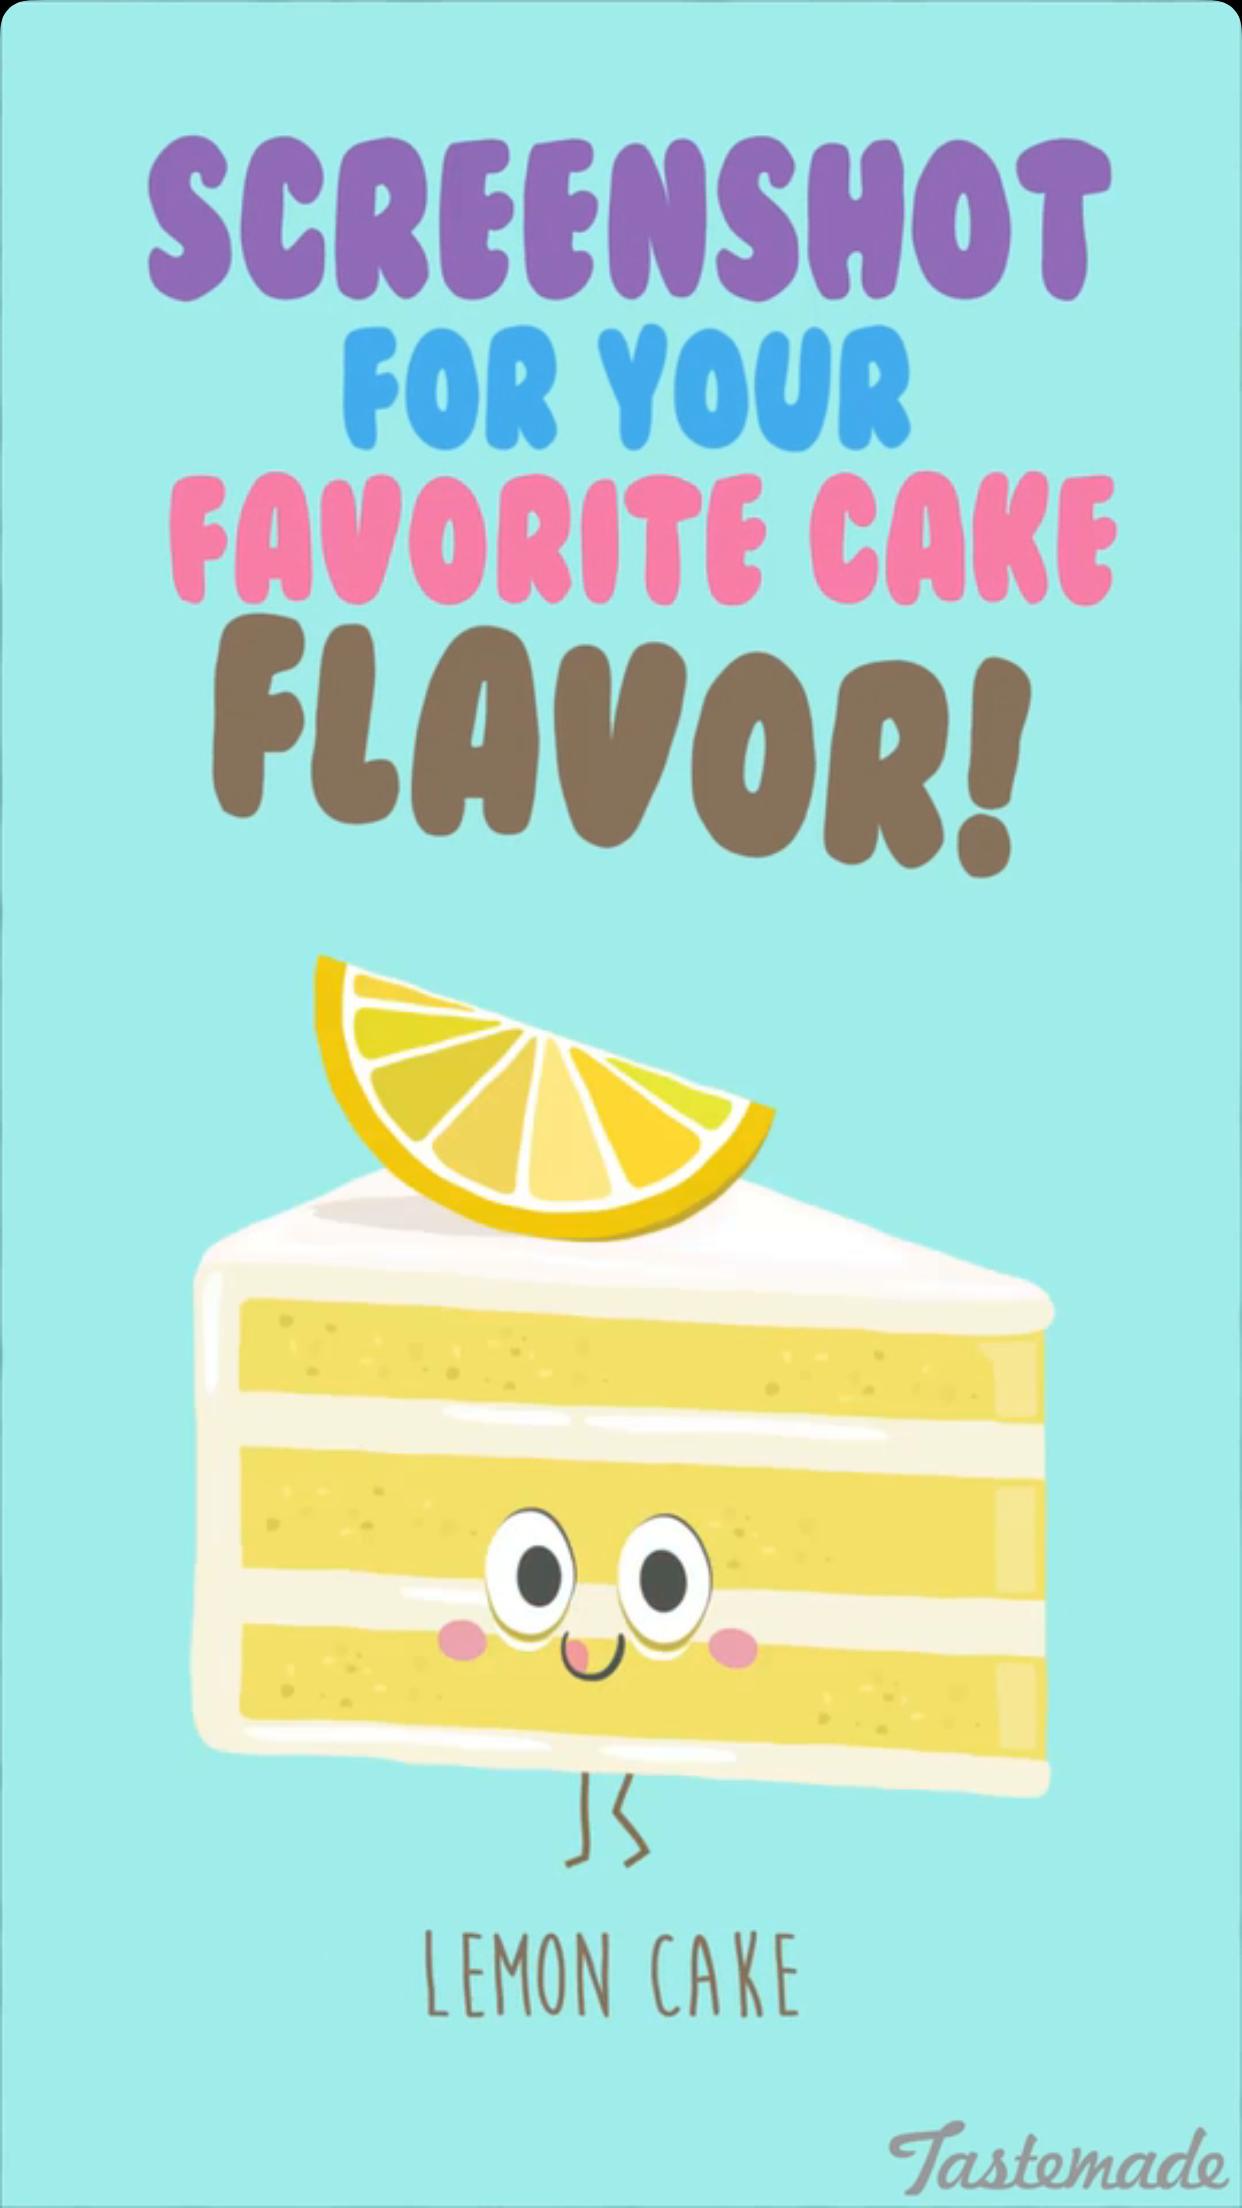 Tastemade Media Illustrations On Snapchat Lemon Cake Drawing